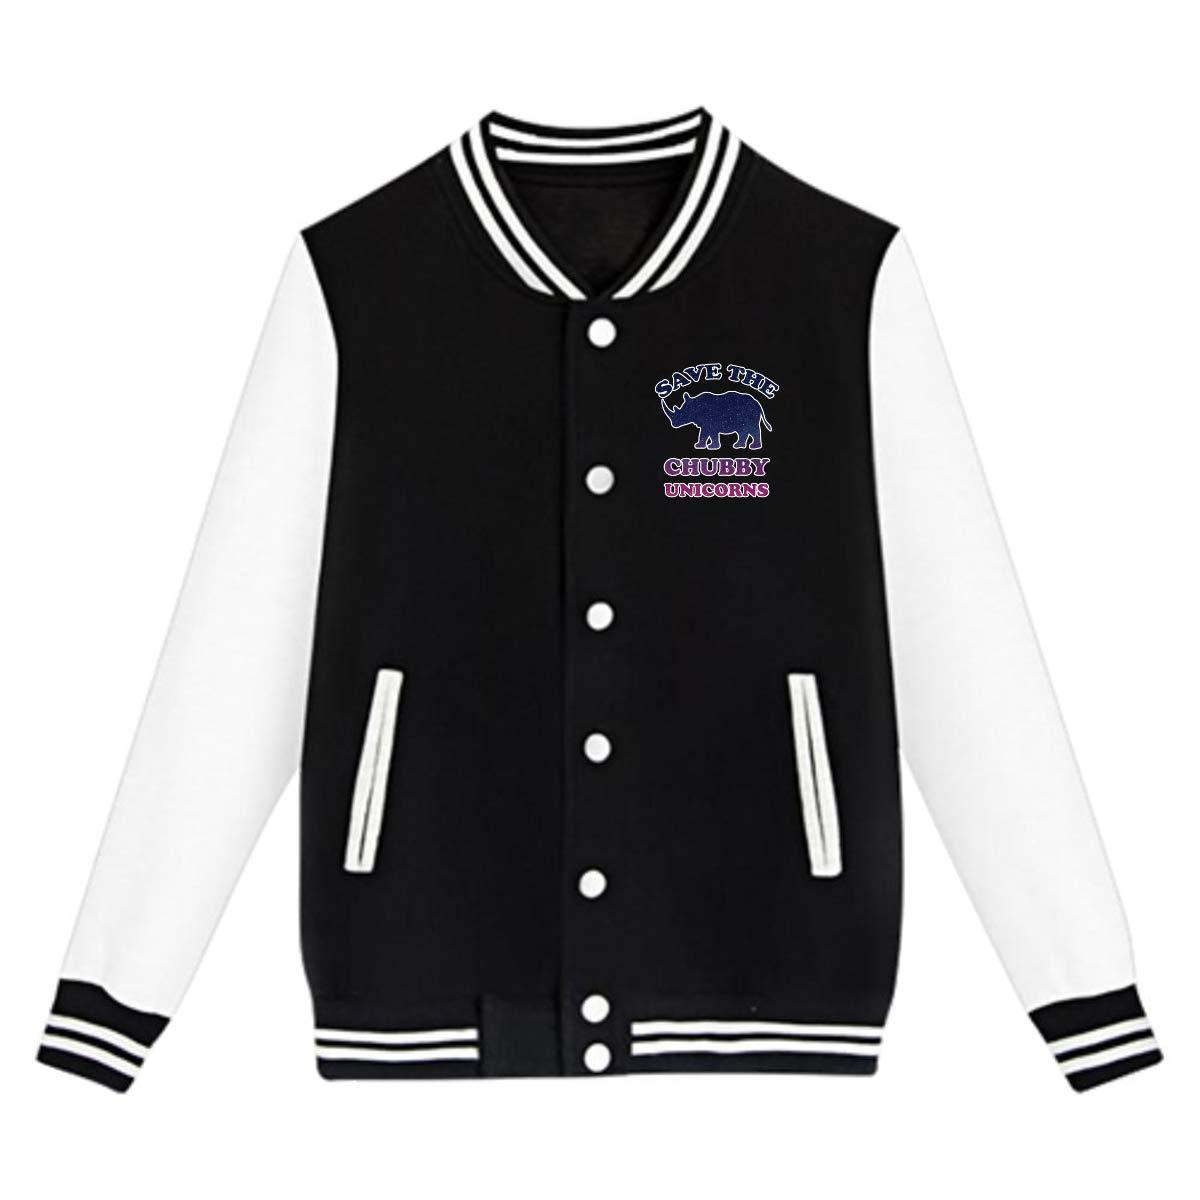 Tina TN Save The Chubby Unicorns Teens Boys Girl Varsity Baseball Jacket Long Sleeve Sport Baseball Uniform Jacket Coat Sweater Black